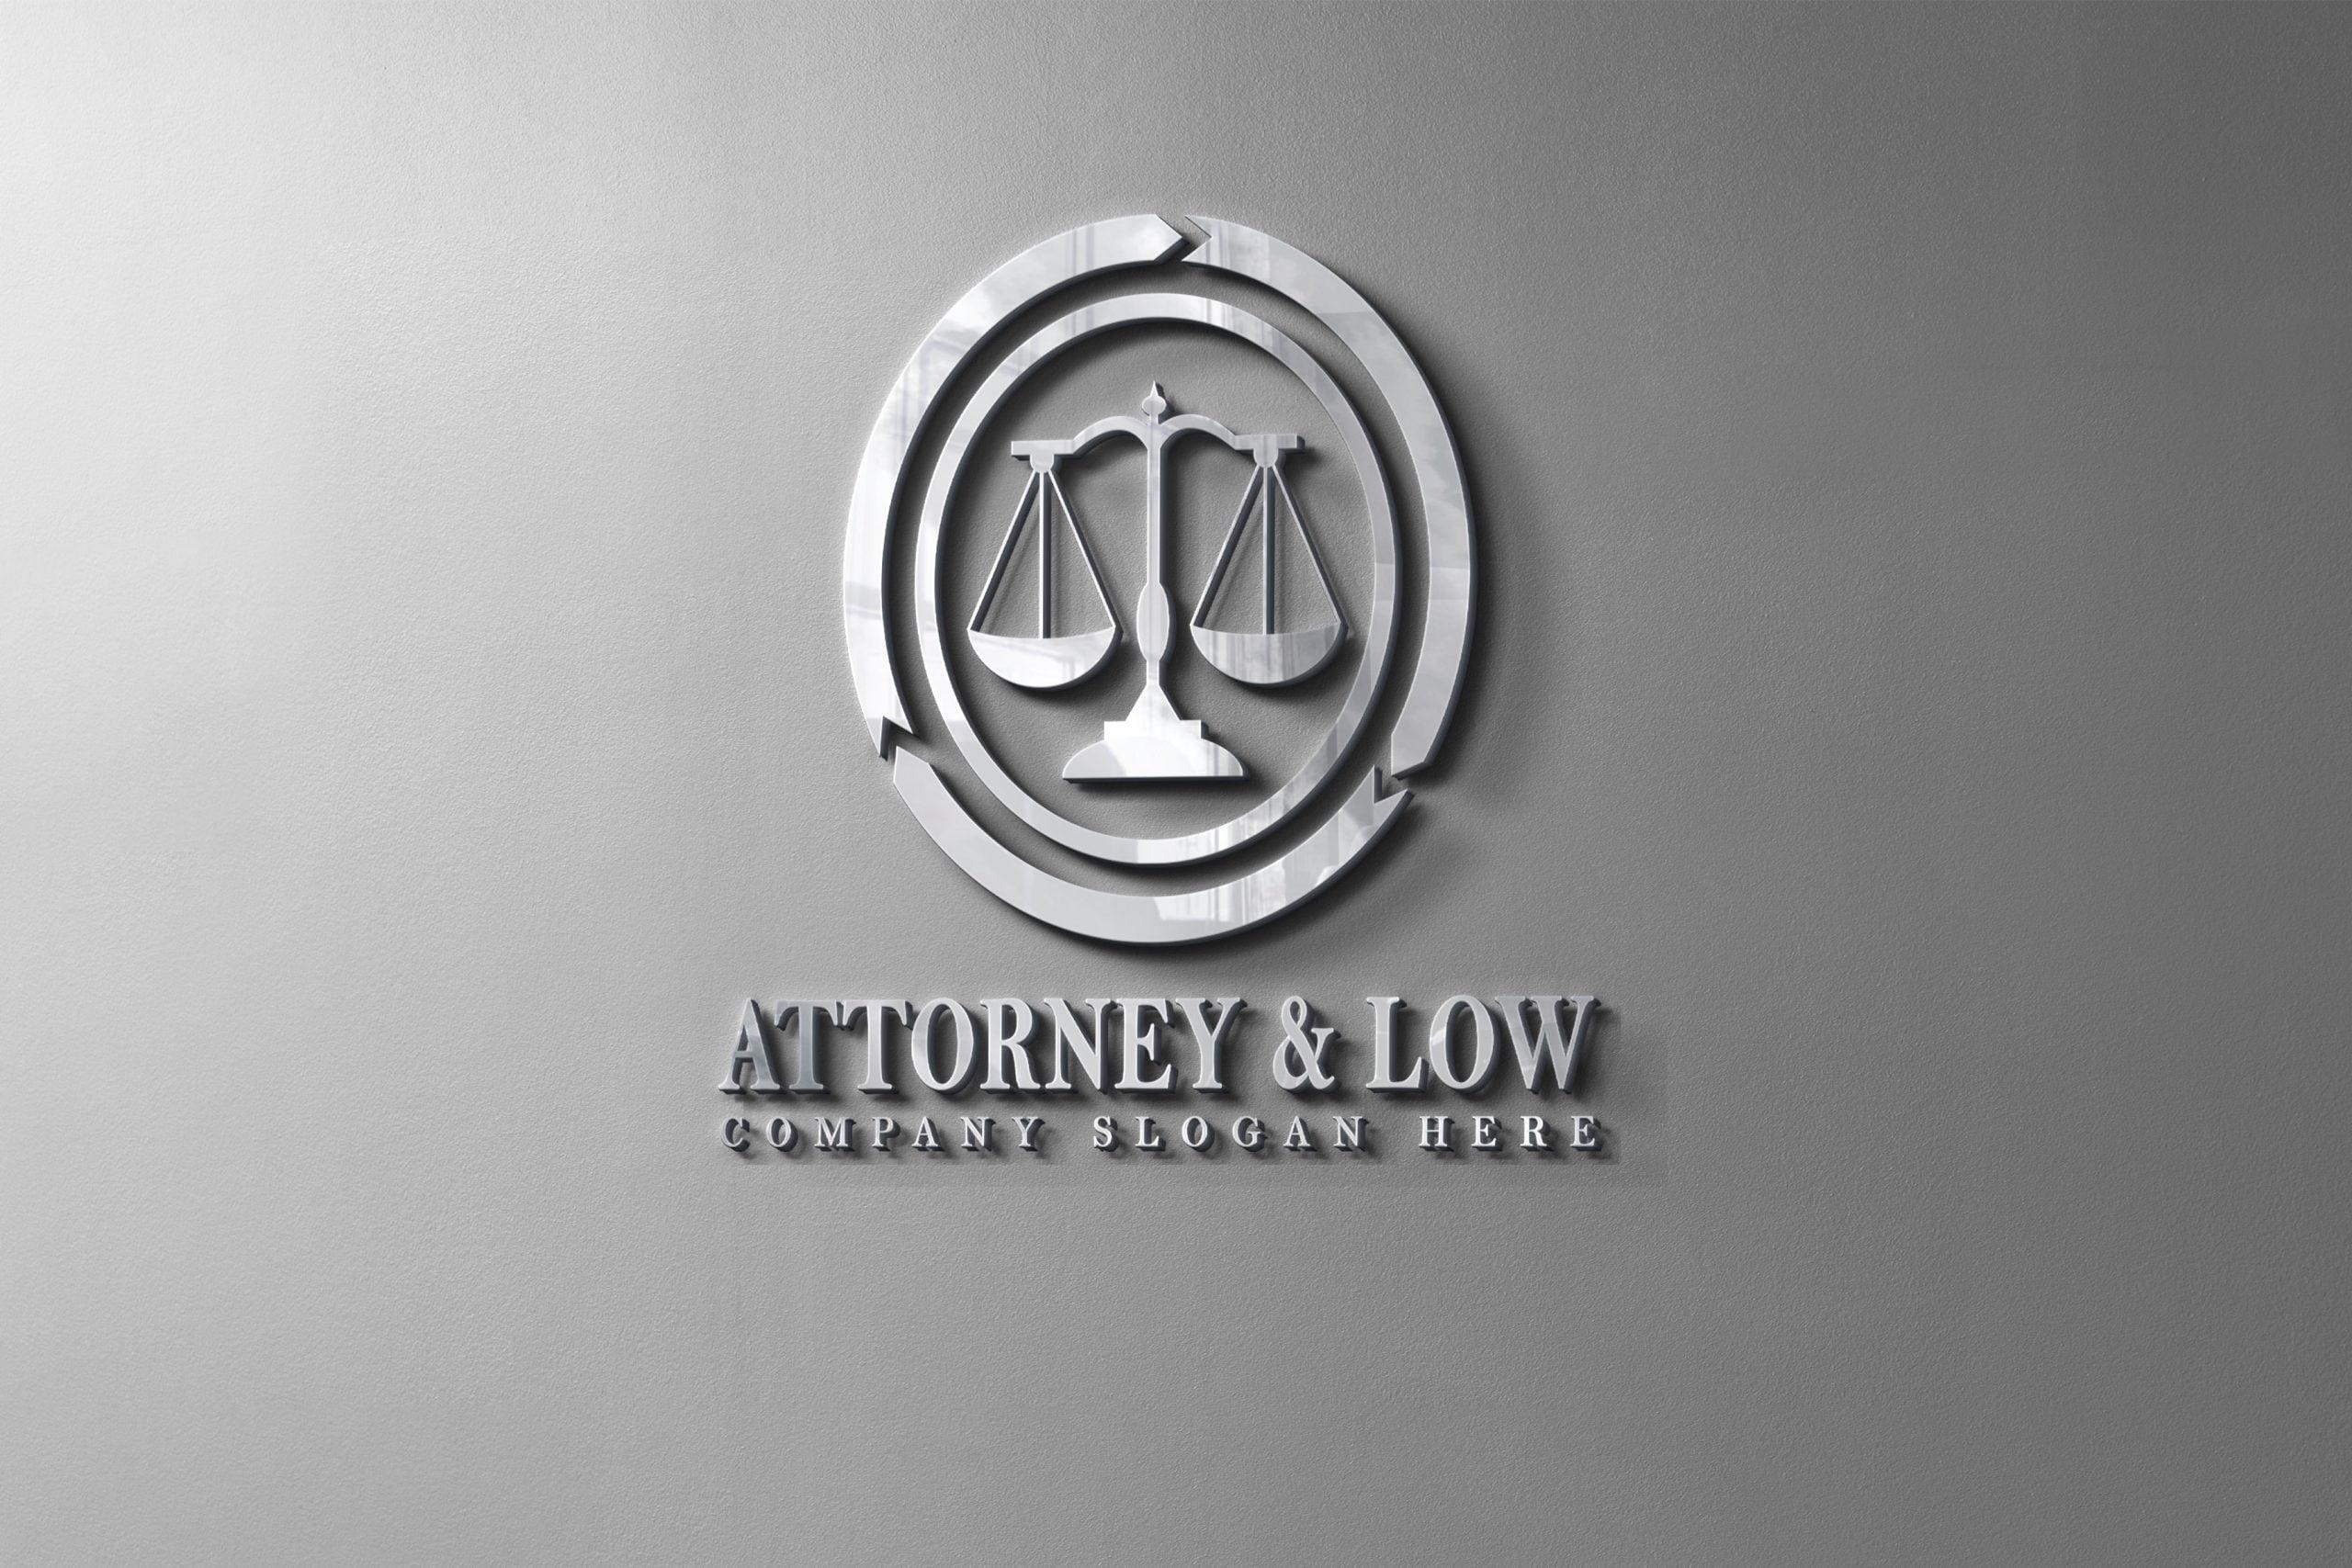 Attorney & Law logo design on metal wall